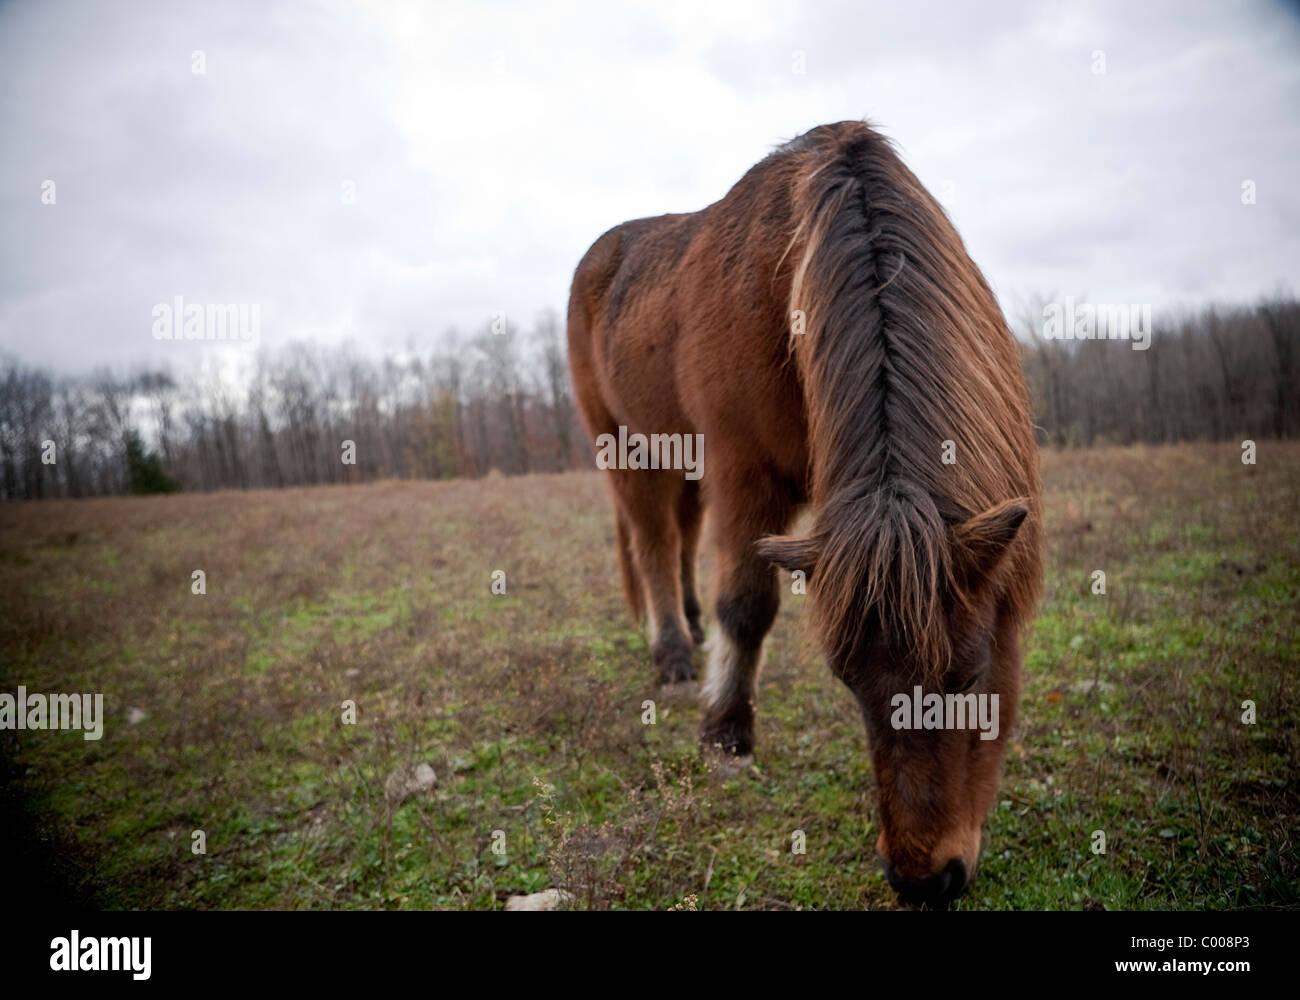 Sand Meadow Farms Icelandic Horses - Stock Image